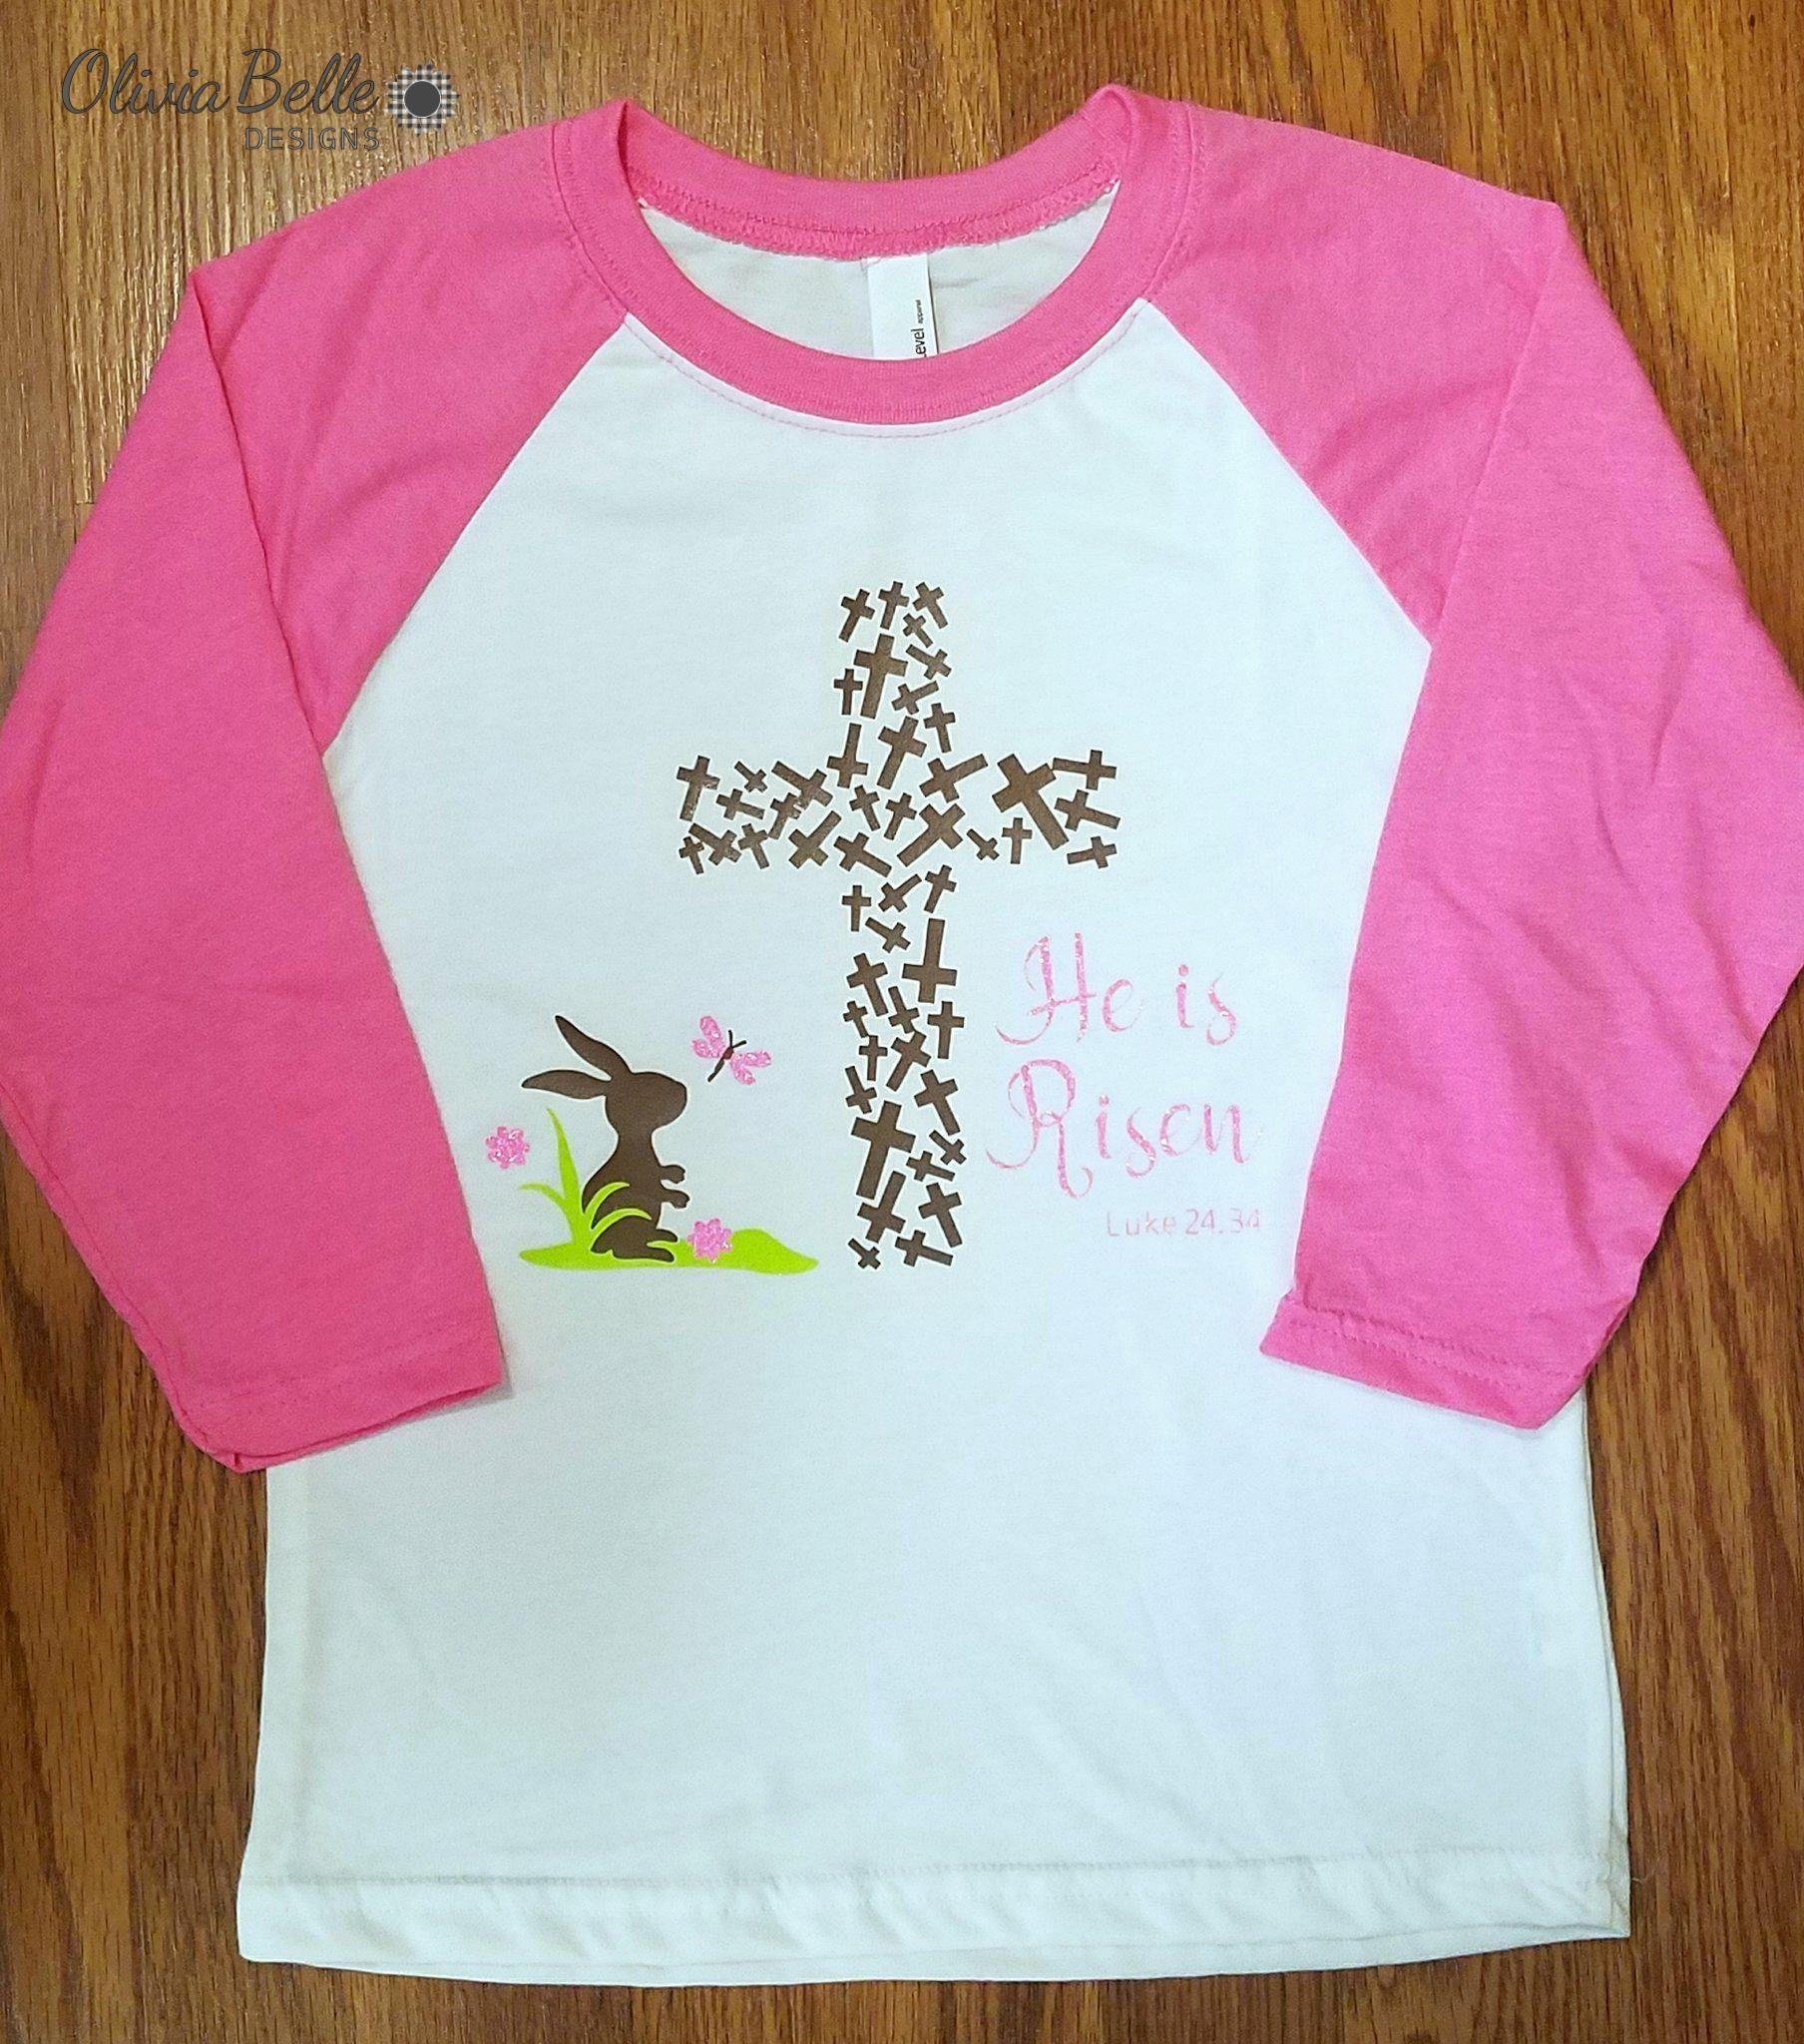 697ec539d He Is Risen Shirt, Girls He Is Risen Shirt, Girls Easter Shirt, Easter Shirt,  He Is Risen Easter Shirt, Easter Shirt For Girls, Christian by ...